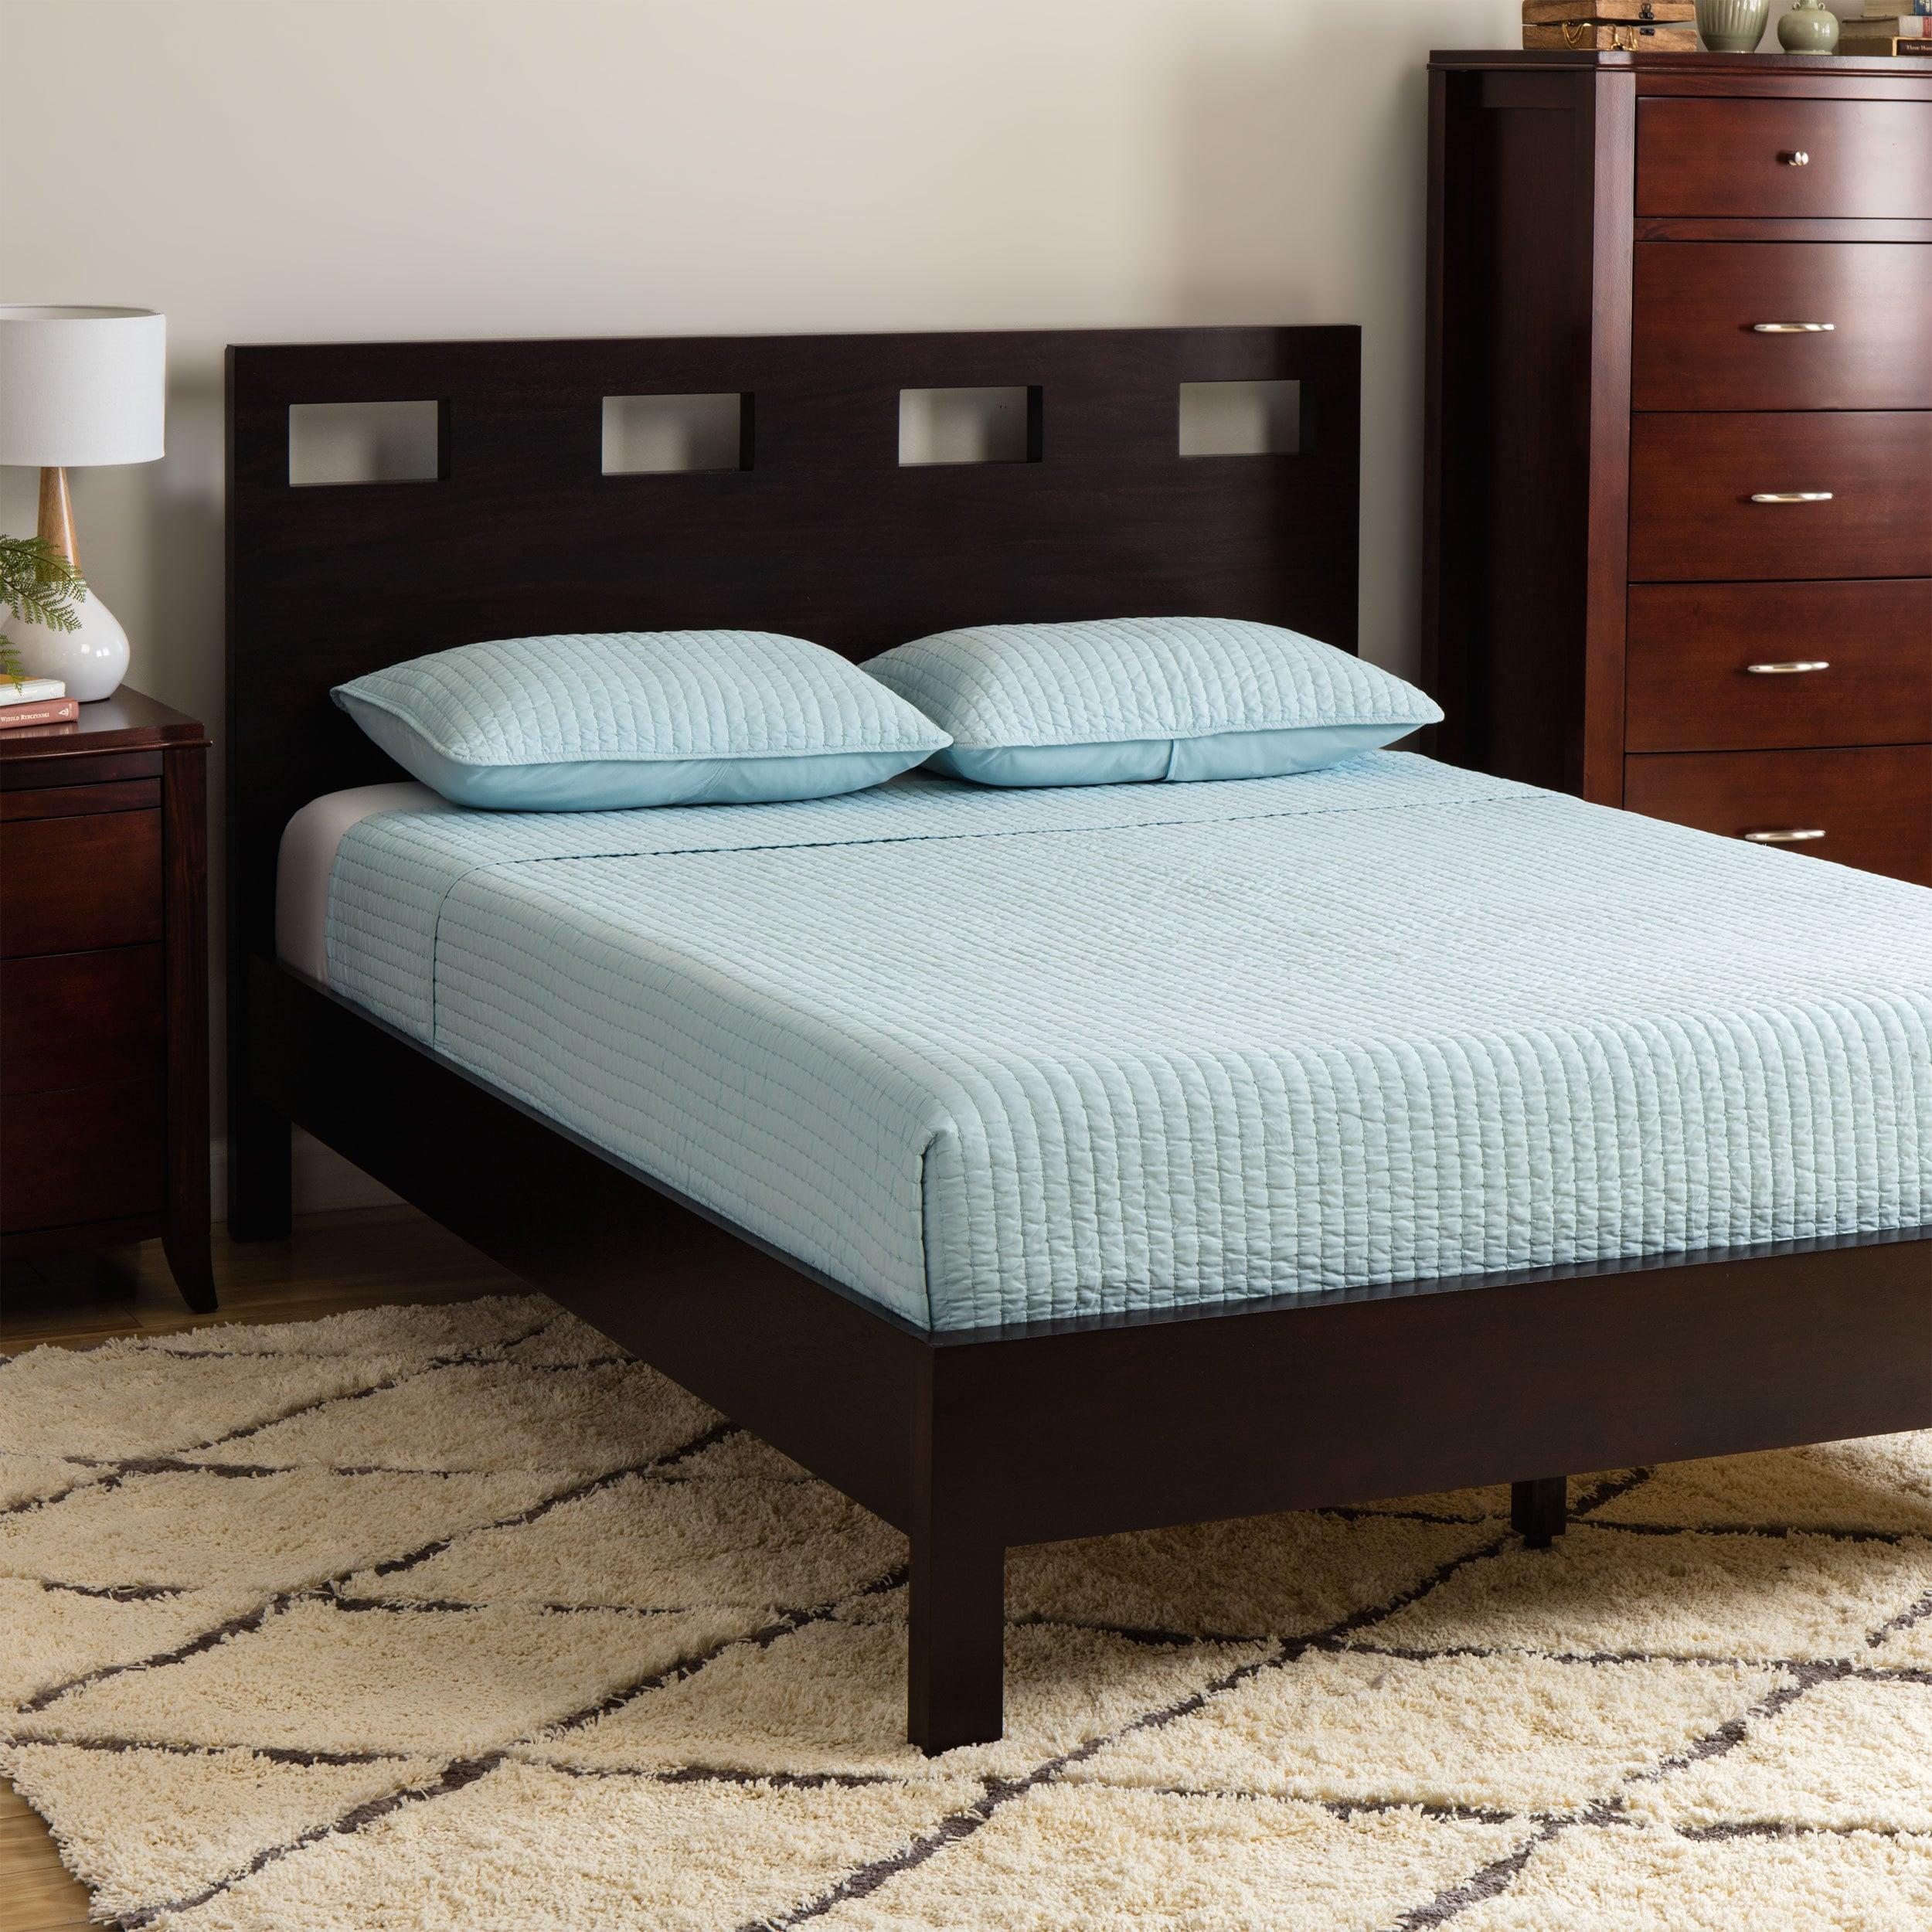 Shop Rectangular Cutout King-size Platform Bed - Free Shipping Today ...